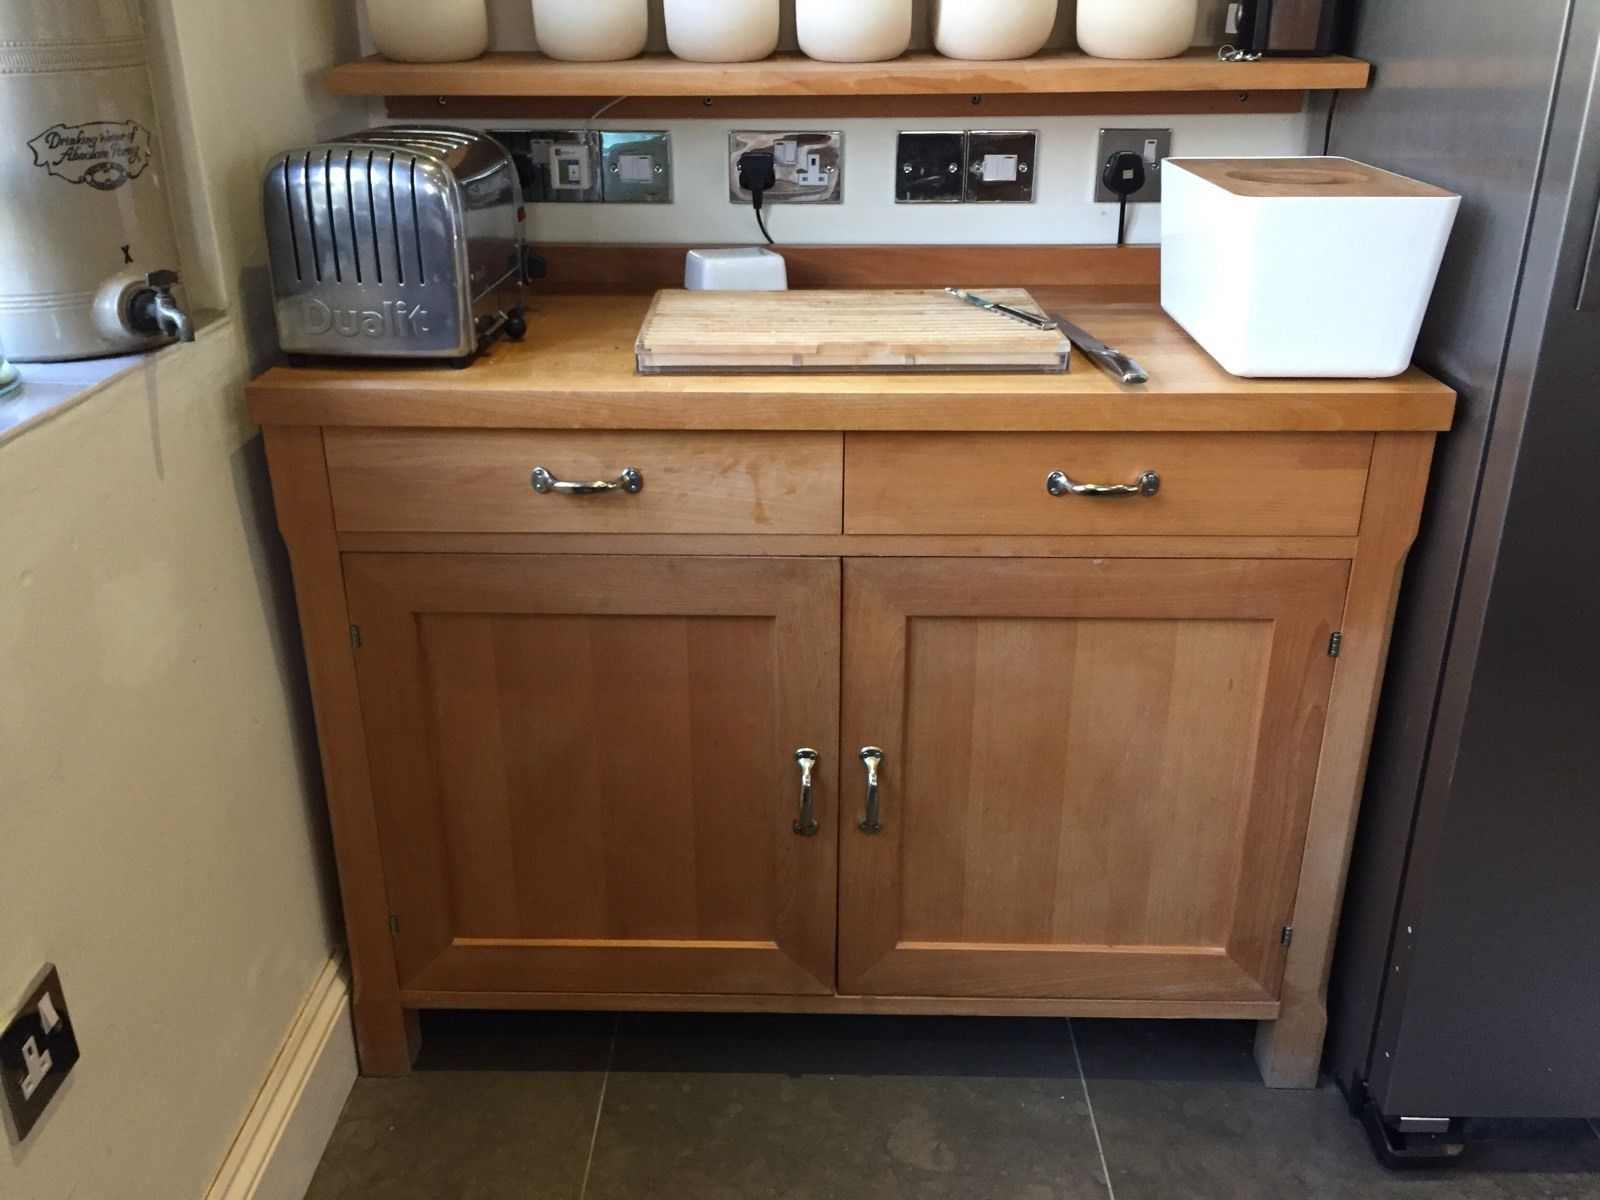 Habitat Olivia Oliva Complete Kitchen Used But Good Condition Complete Kitchens Kitchen Kitchen Units